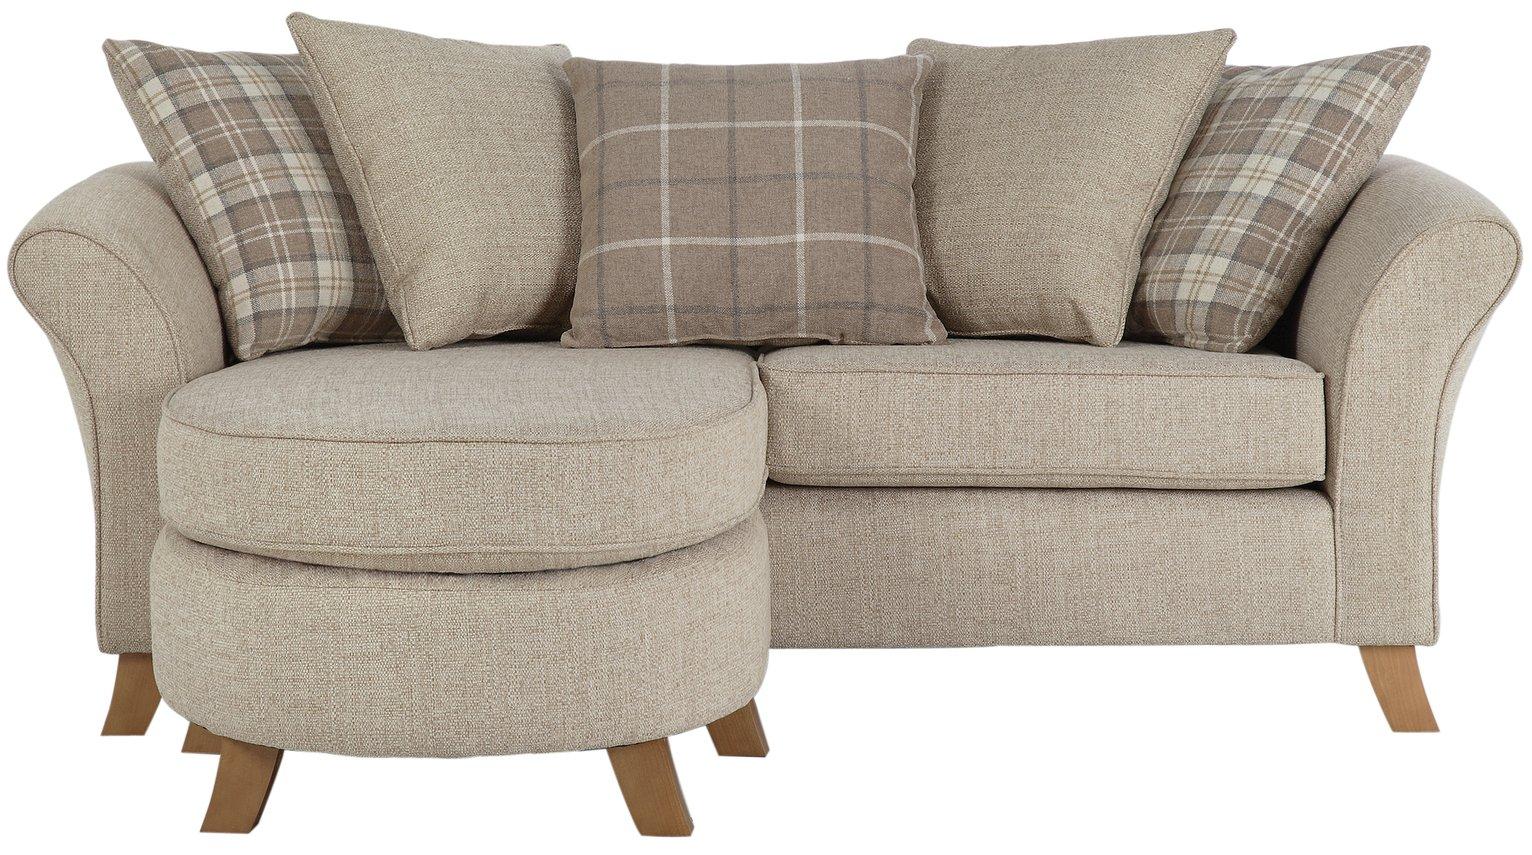 argos ava fabric sofa review davenport origin collection kayla 3 seater chaise longue